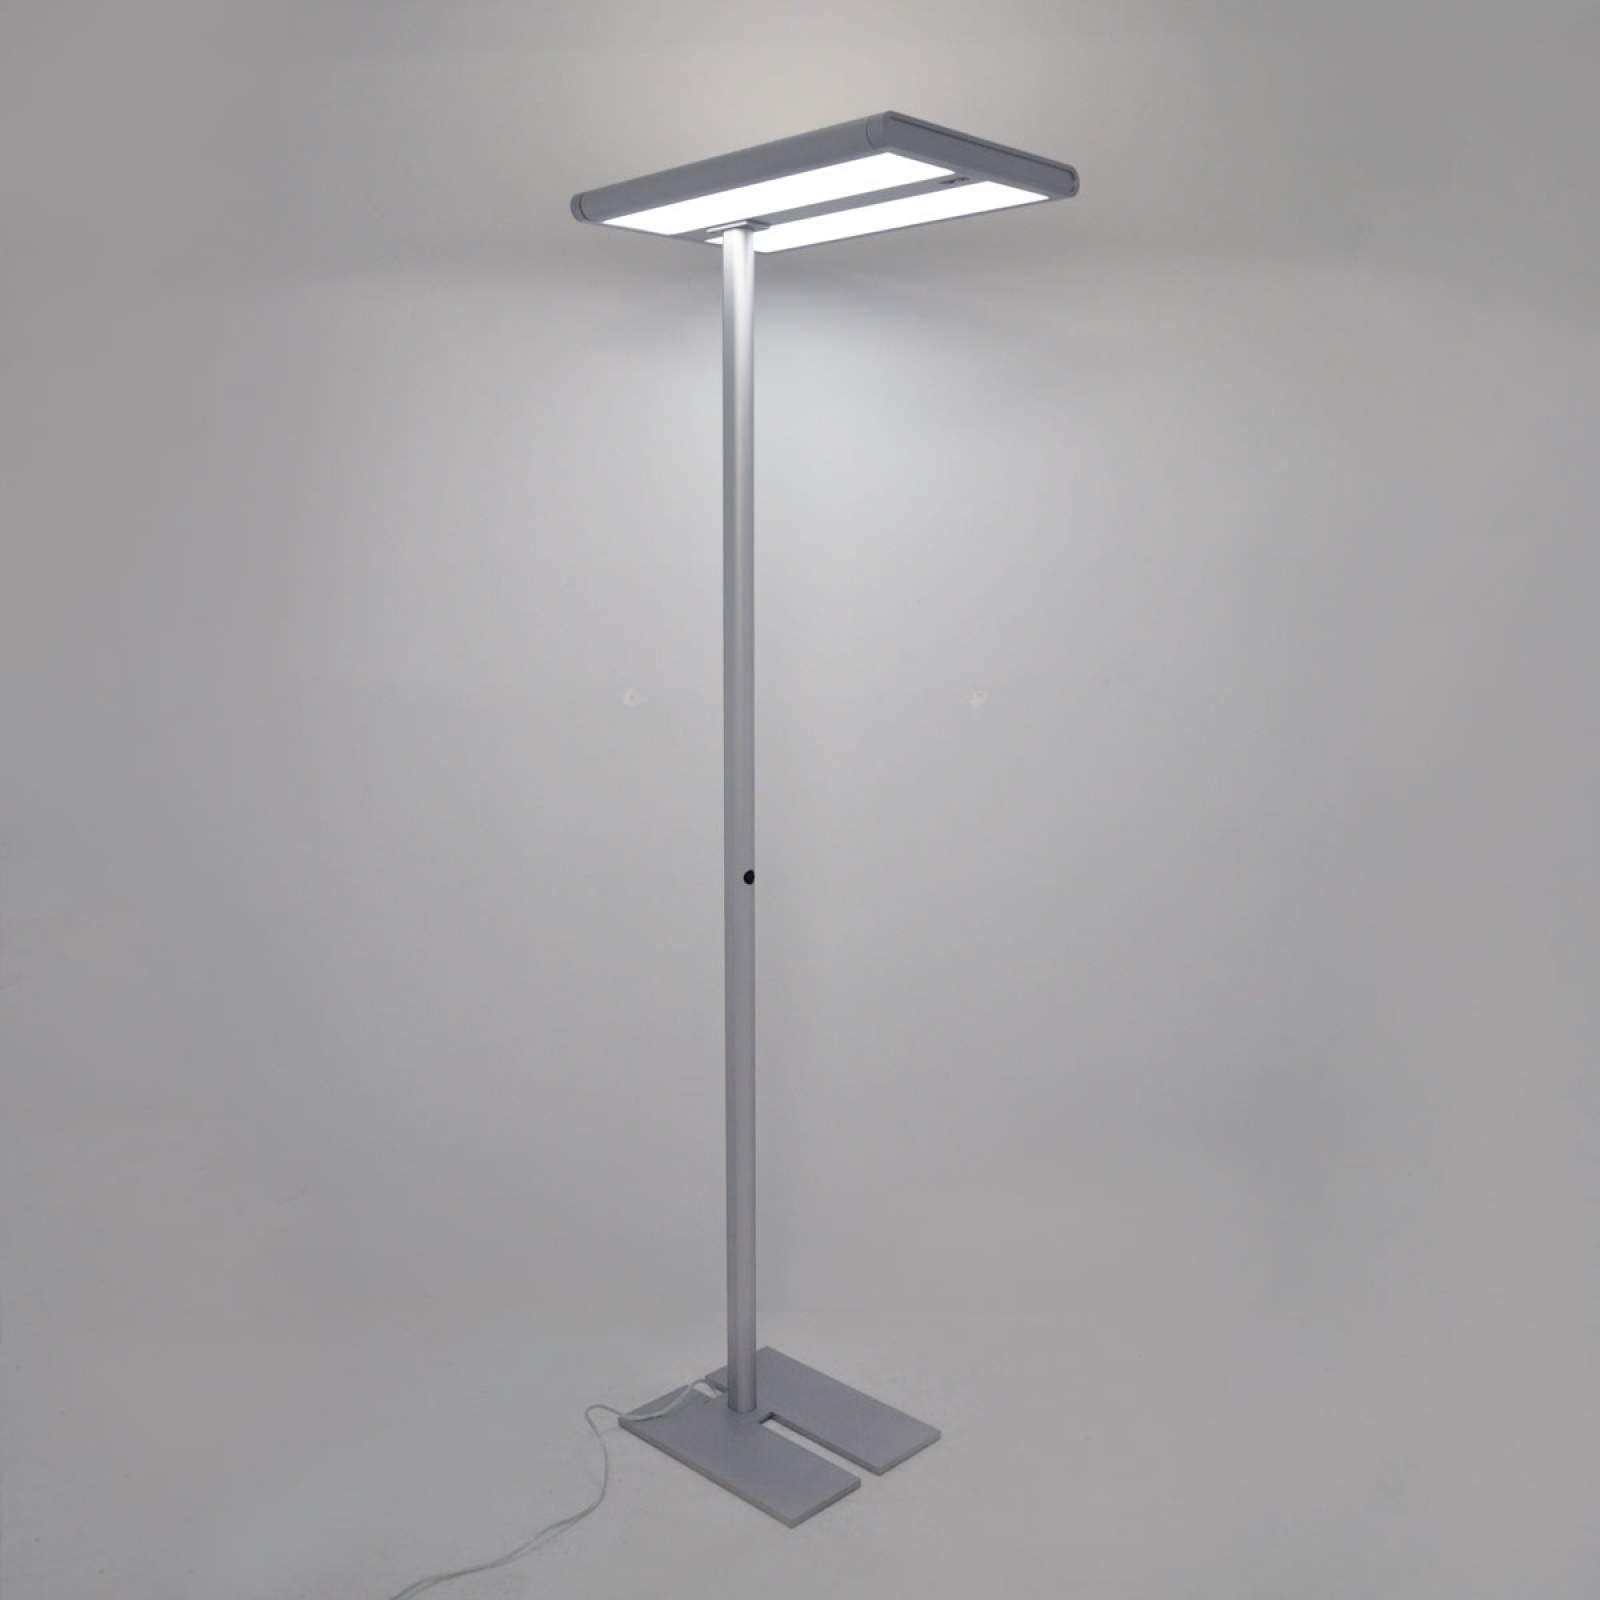 Quirin Led Buro Stehlampe Mit Tageslichtsensor Stehlampe